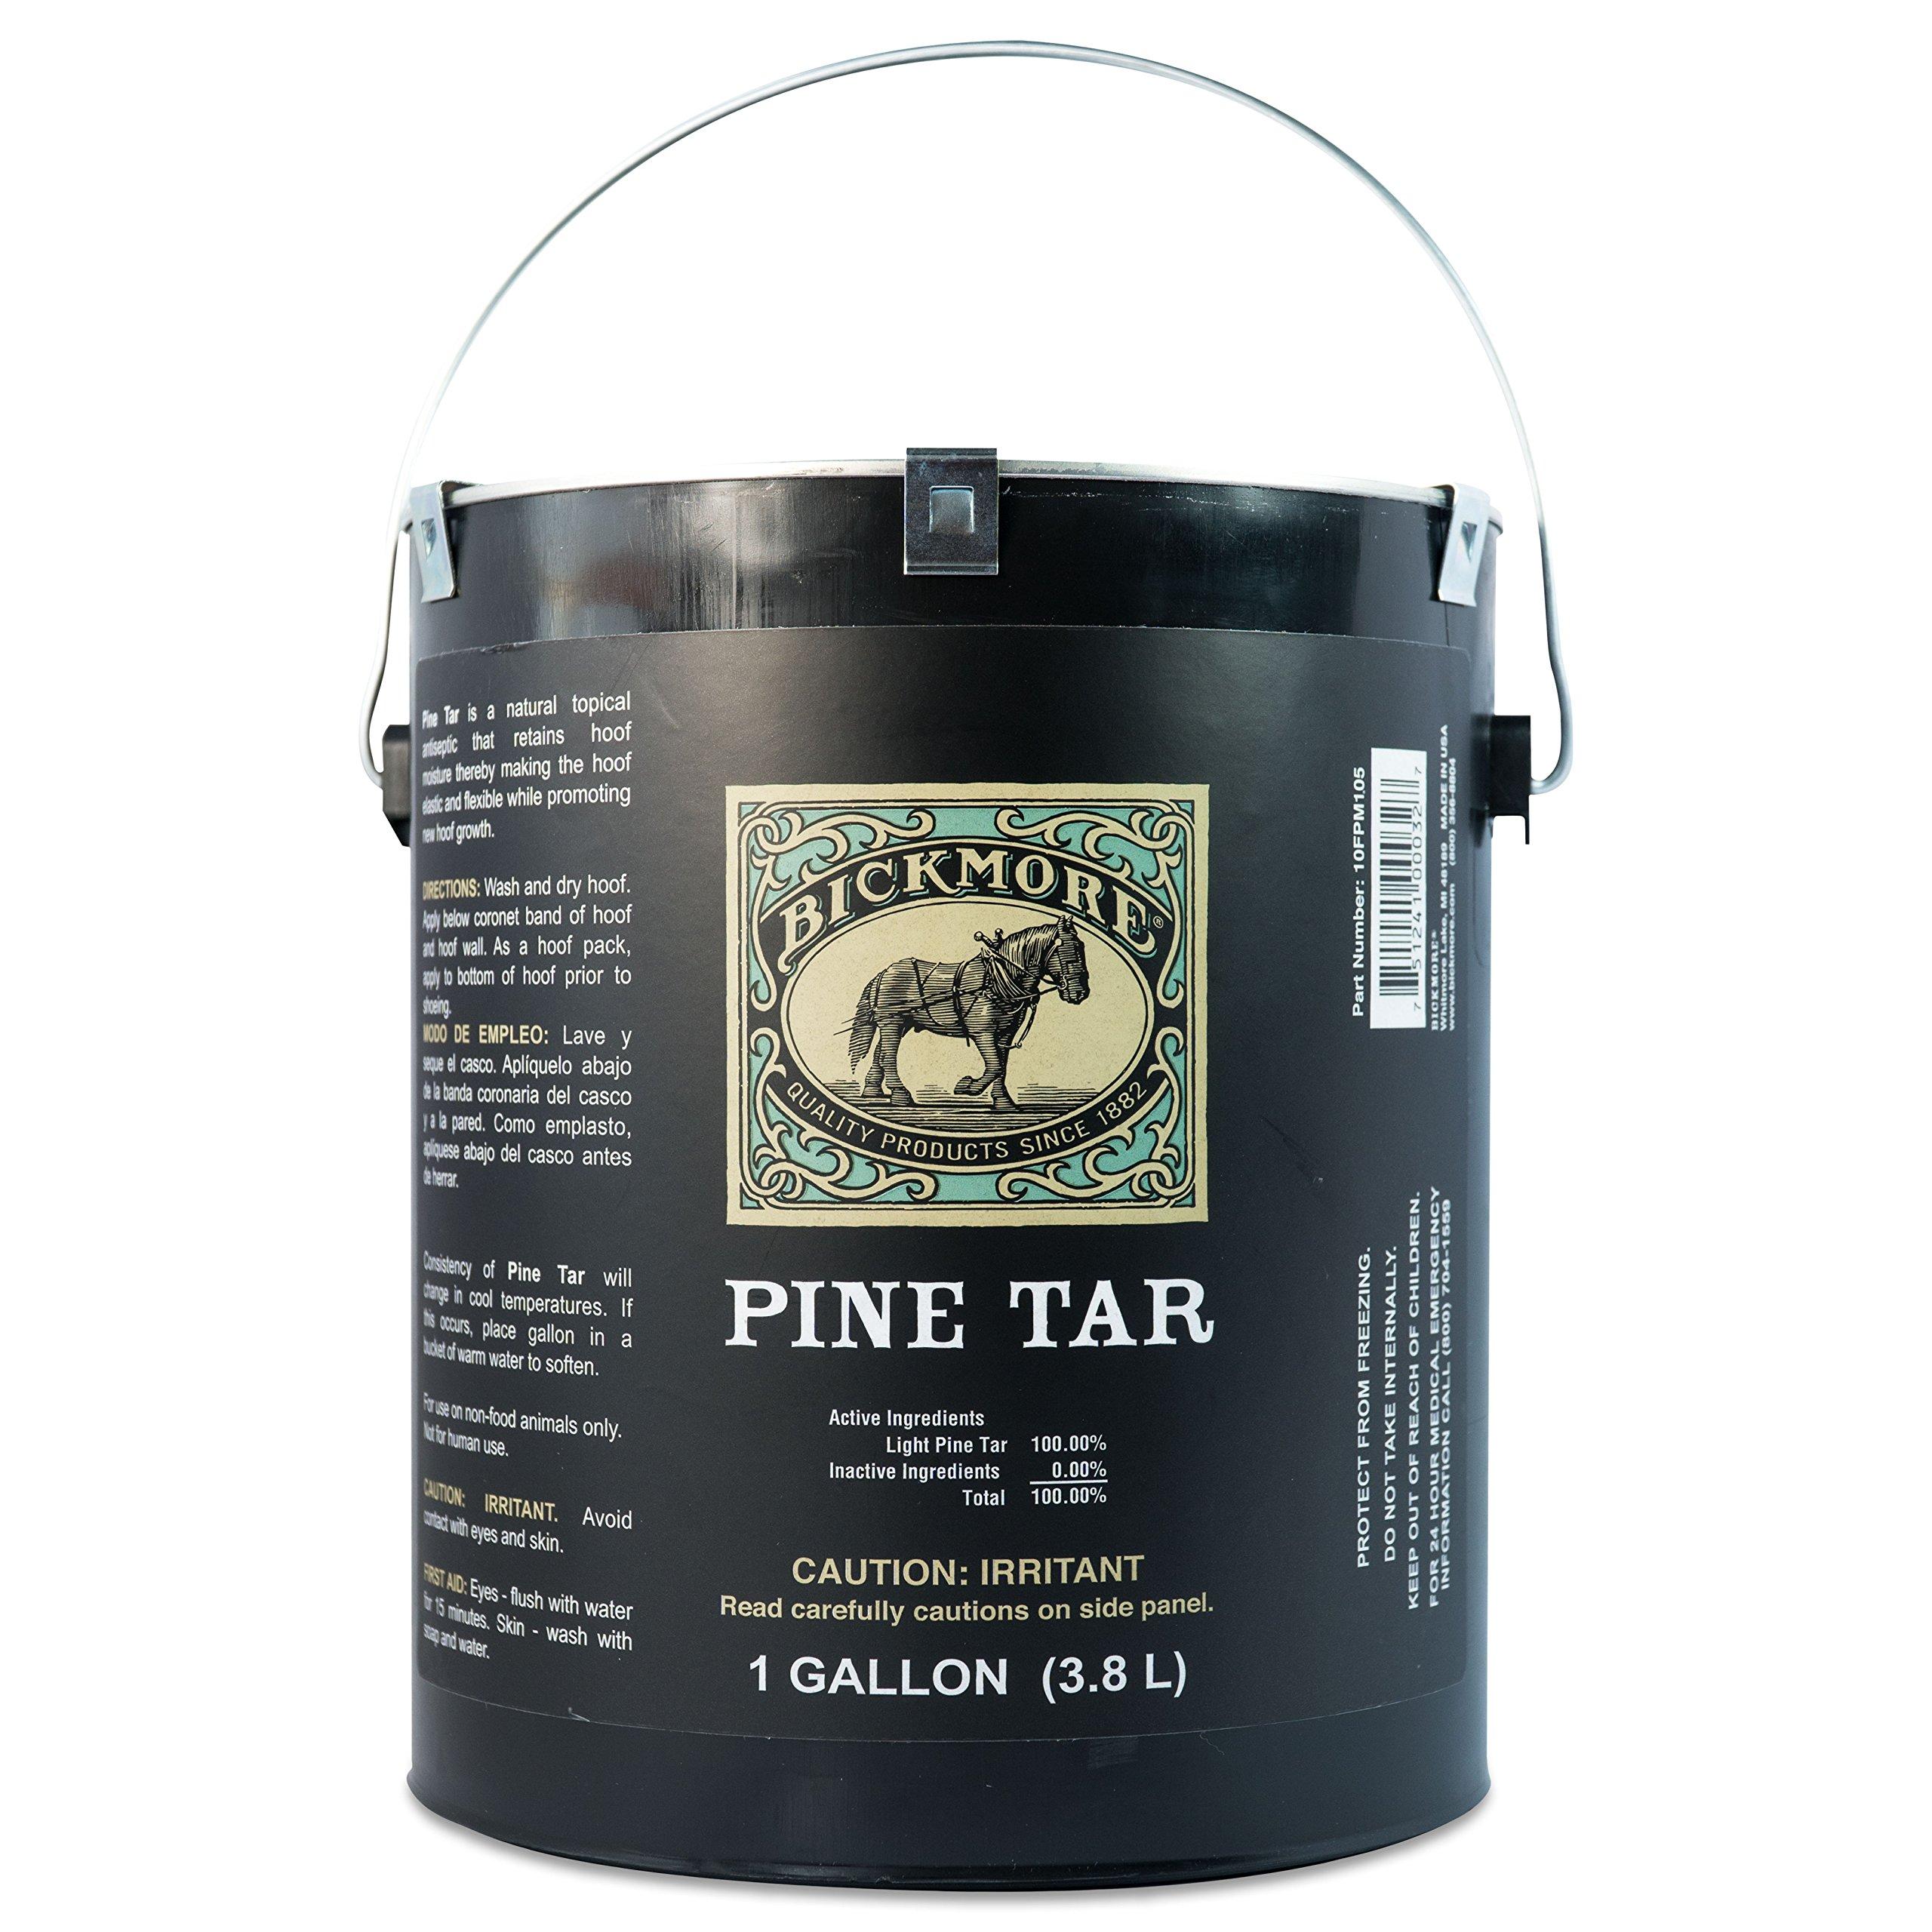 Bickmore Pine Tar 1 Gallon - Hoof Care Formula For Horses